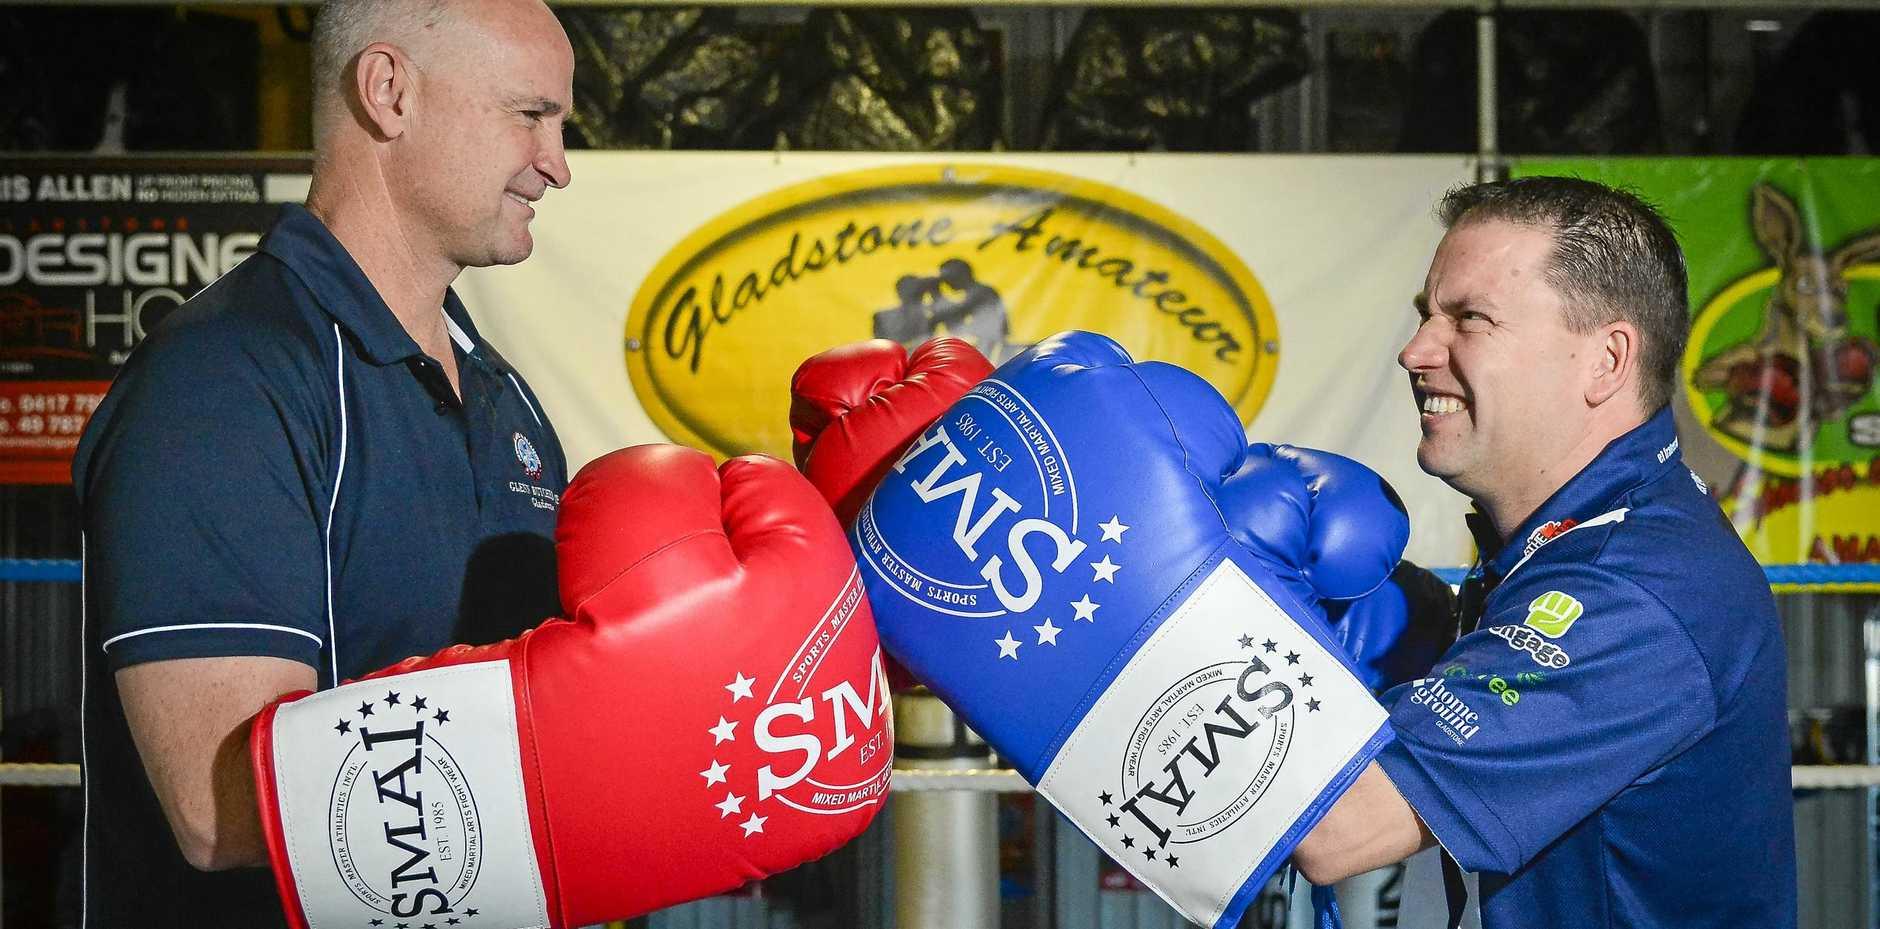 Glenn Butcher and  Matt Burnett will face off in a charity boxing match on Saturday.